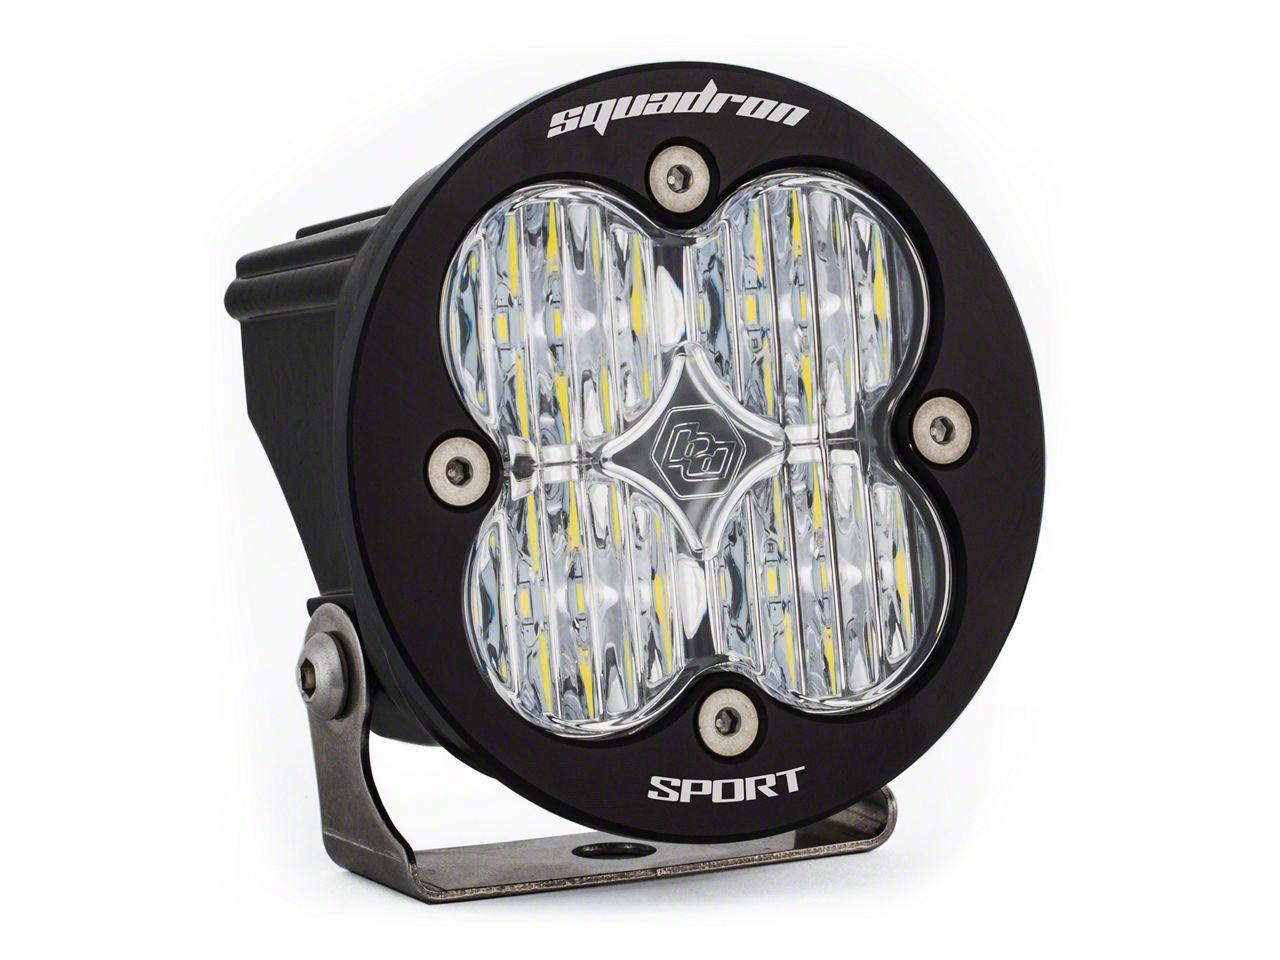 Baja Designs Squadron-R Sport LED Light - Wide Cornering Beam